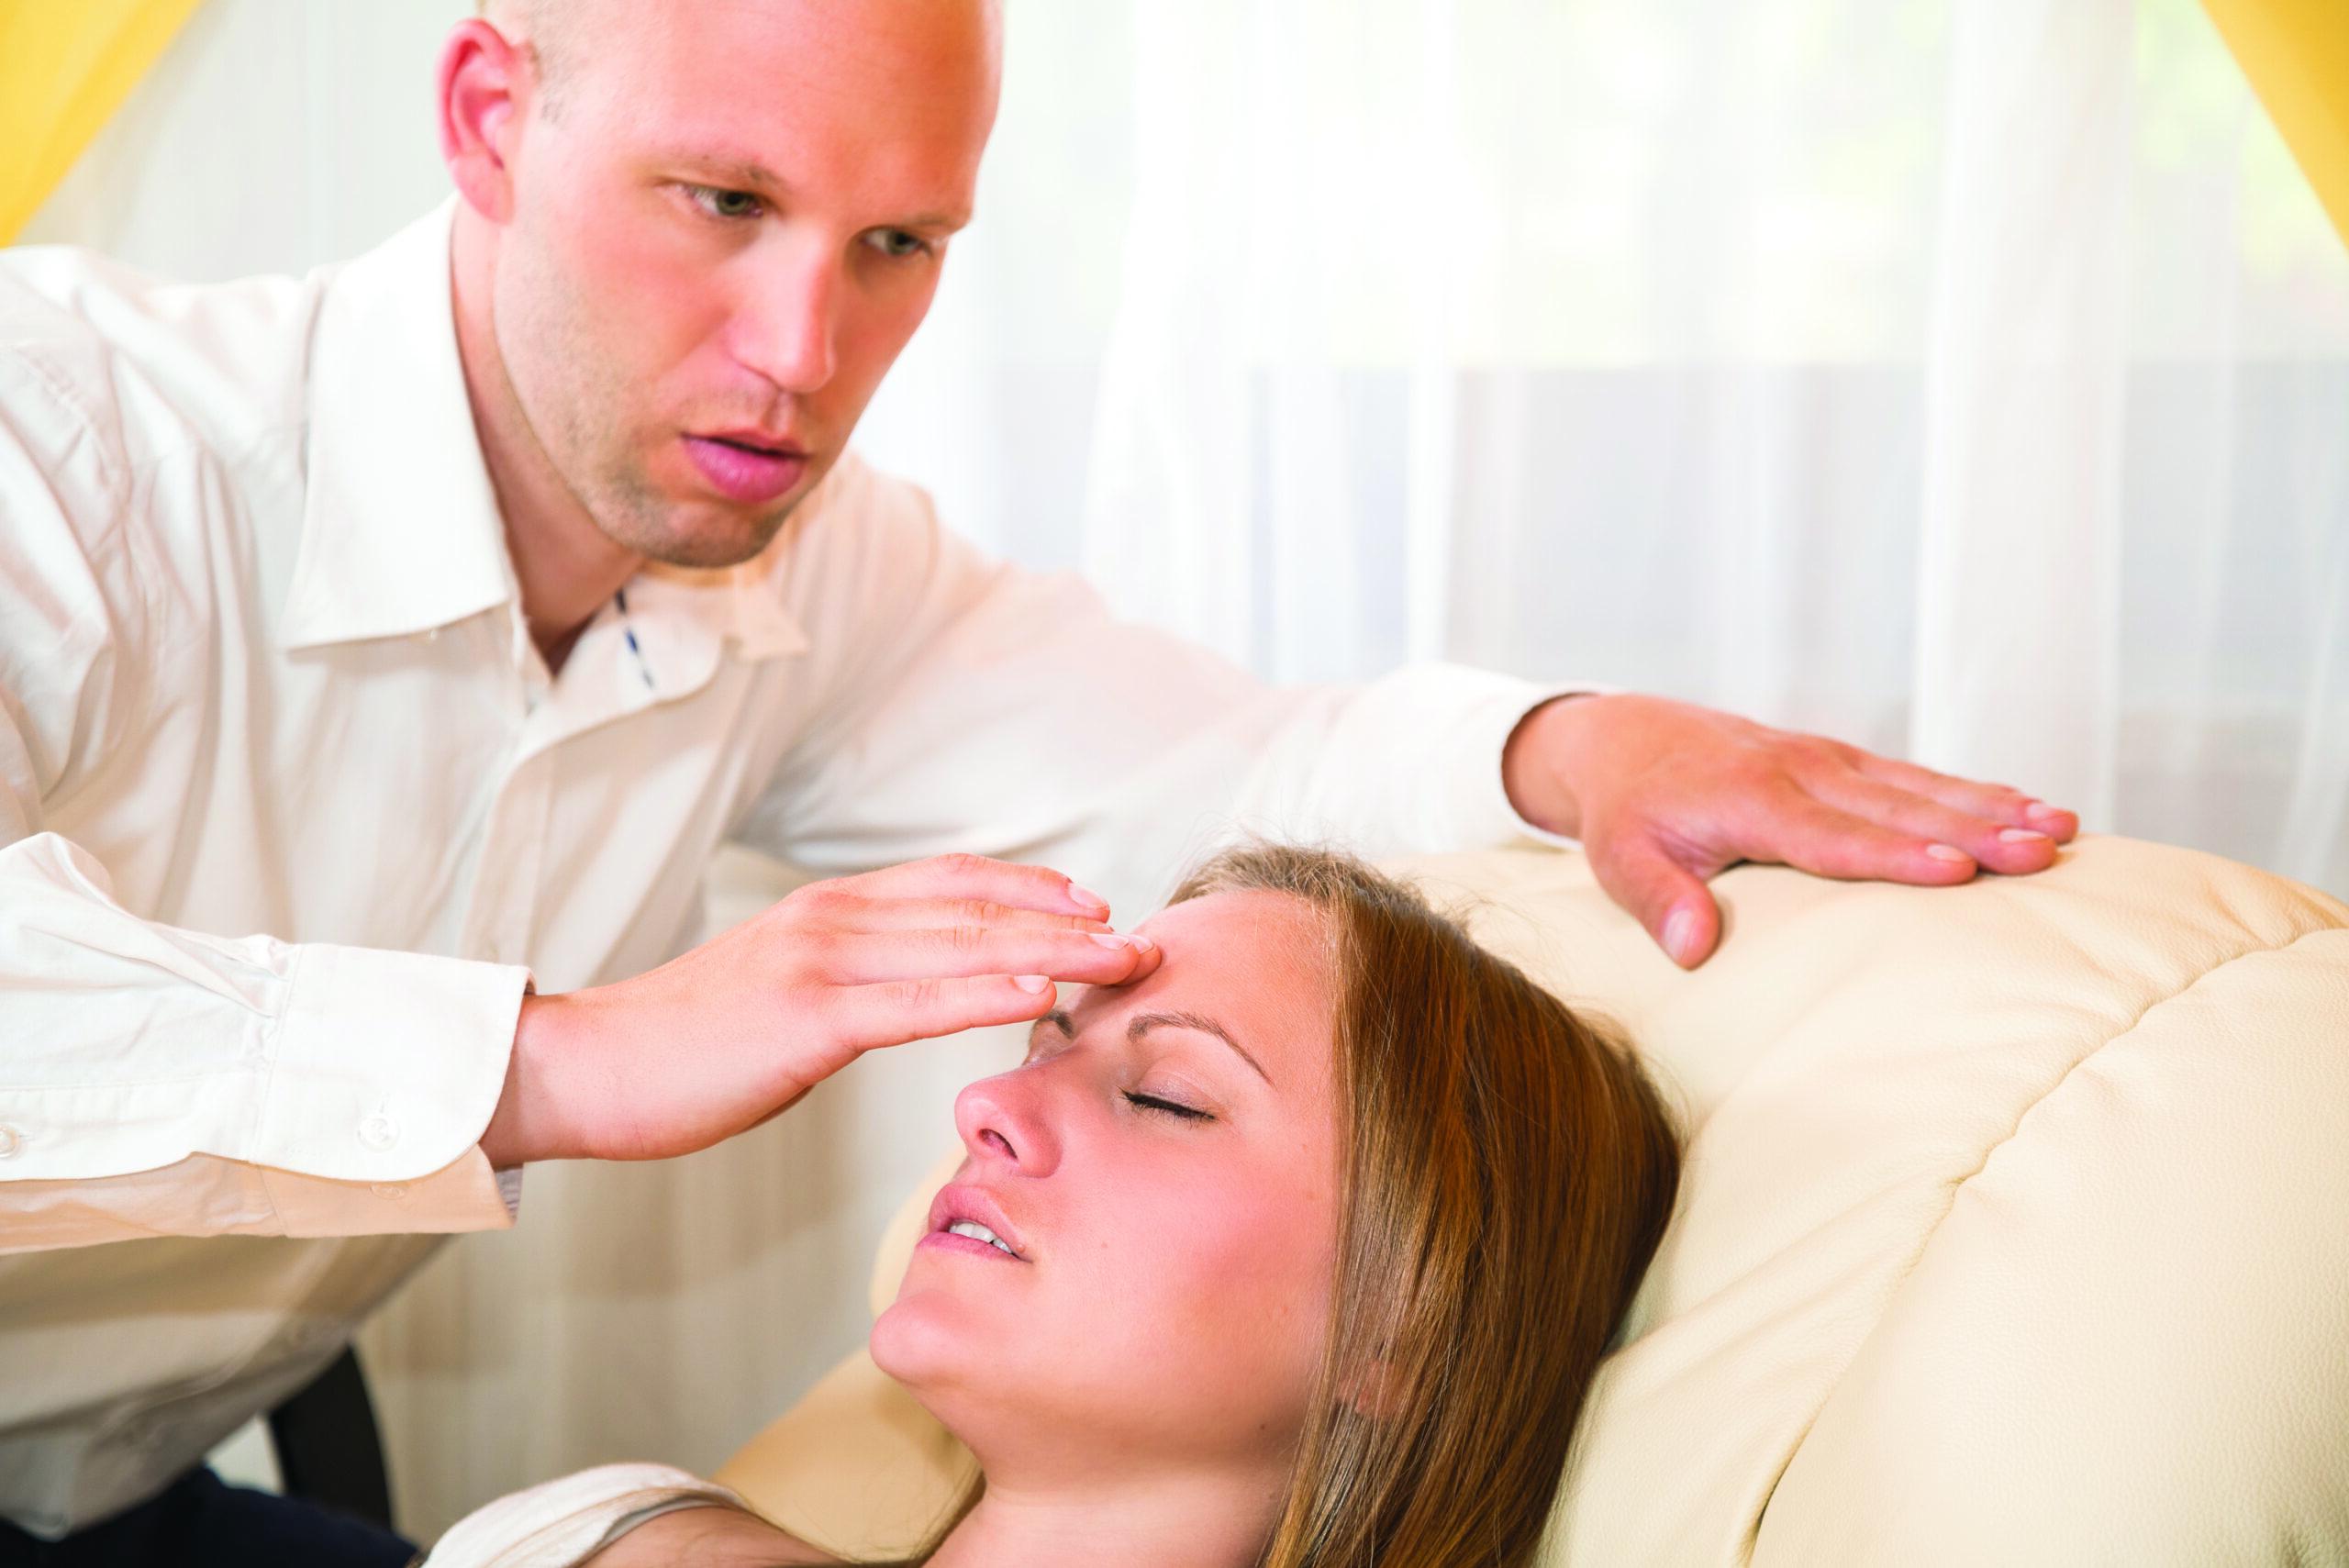 Hypnosis: A Gentler Approach Than Battling Cancer